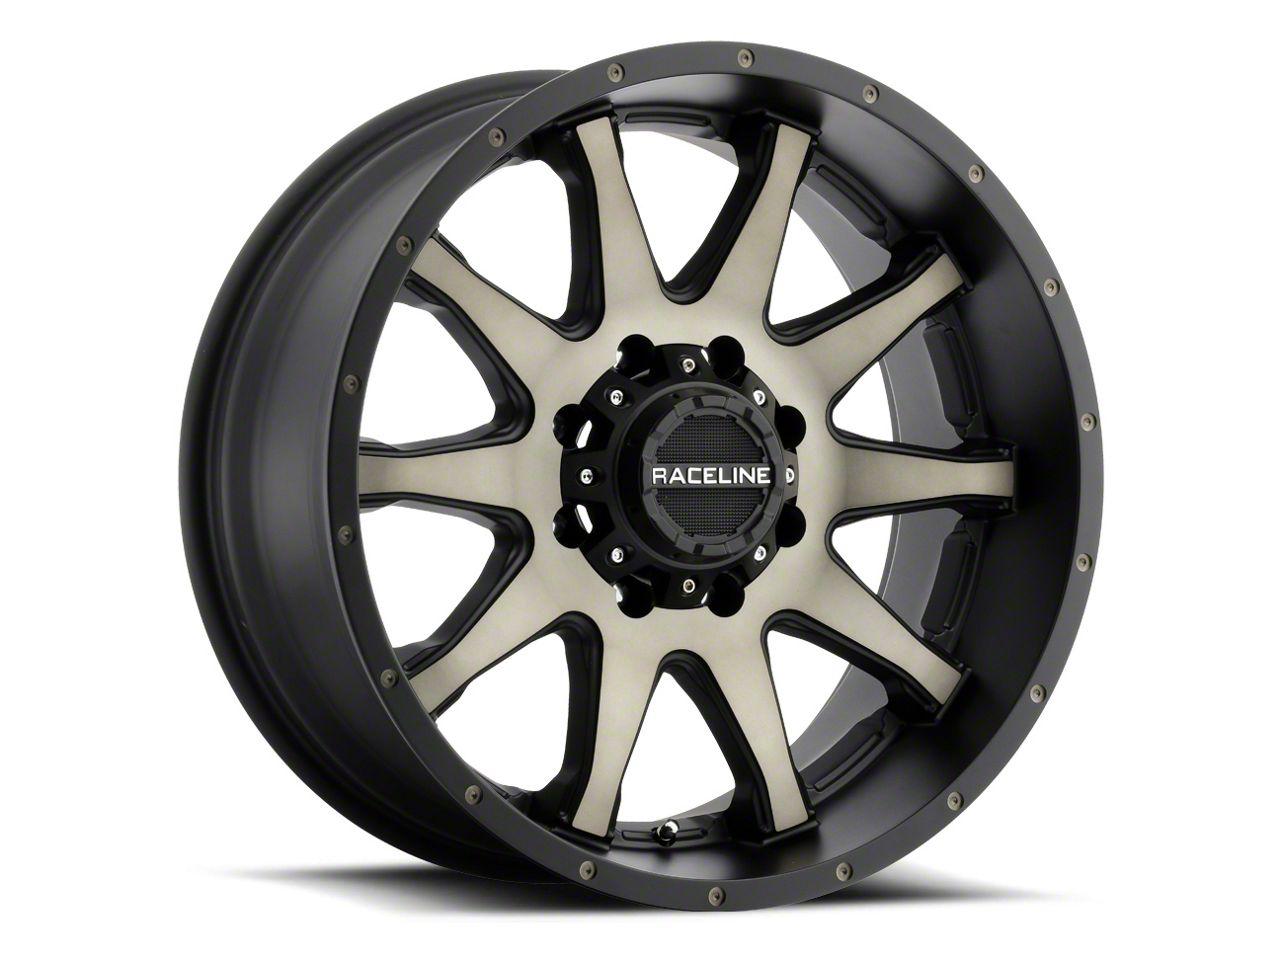 Raceline Shift Black Machined w/ Dark Tint Wheel - 17x8.5 (18-19 Jeep Wrangler JL)